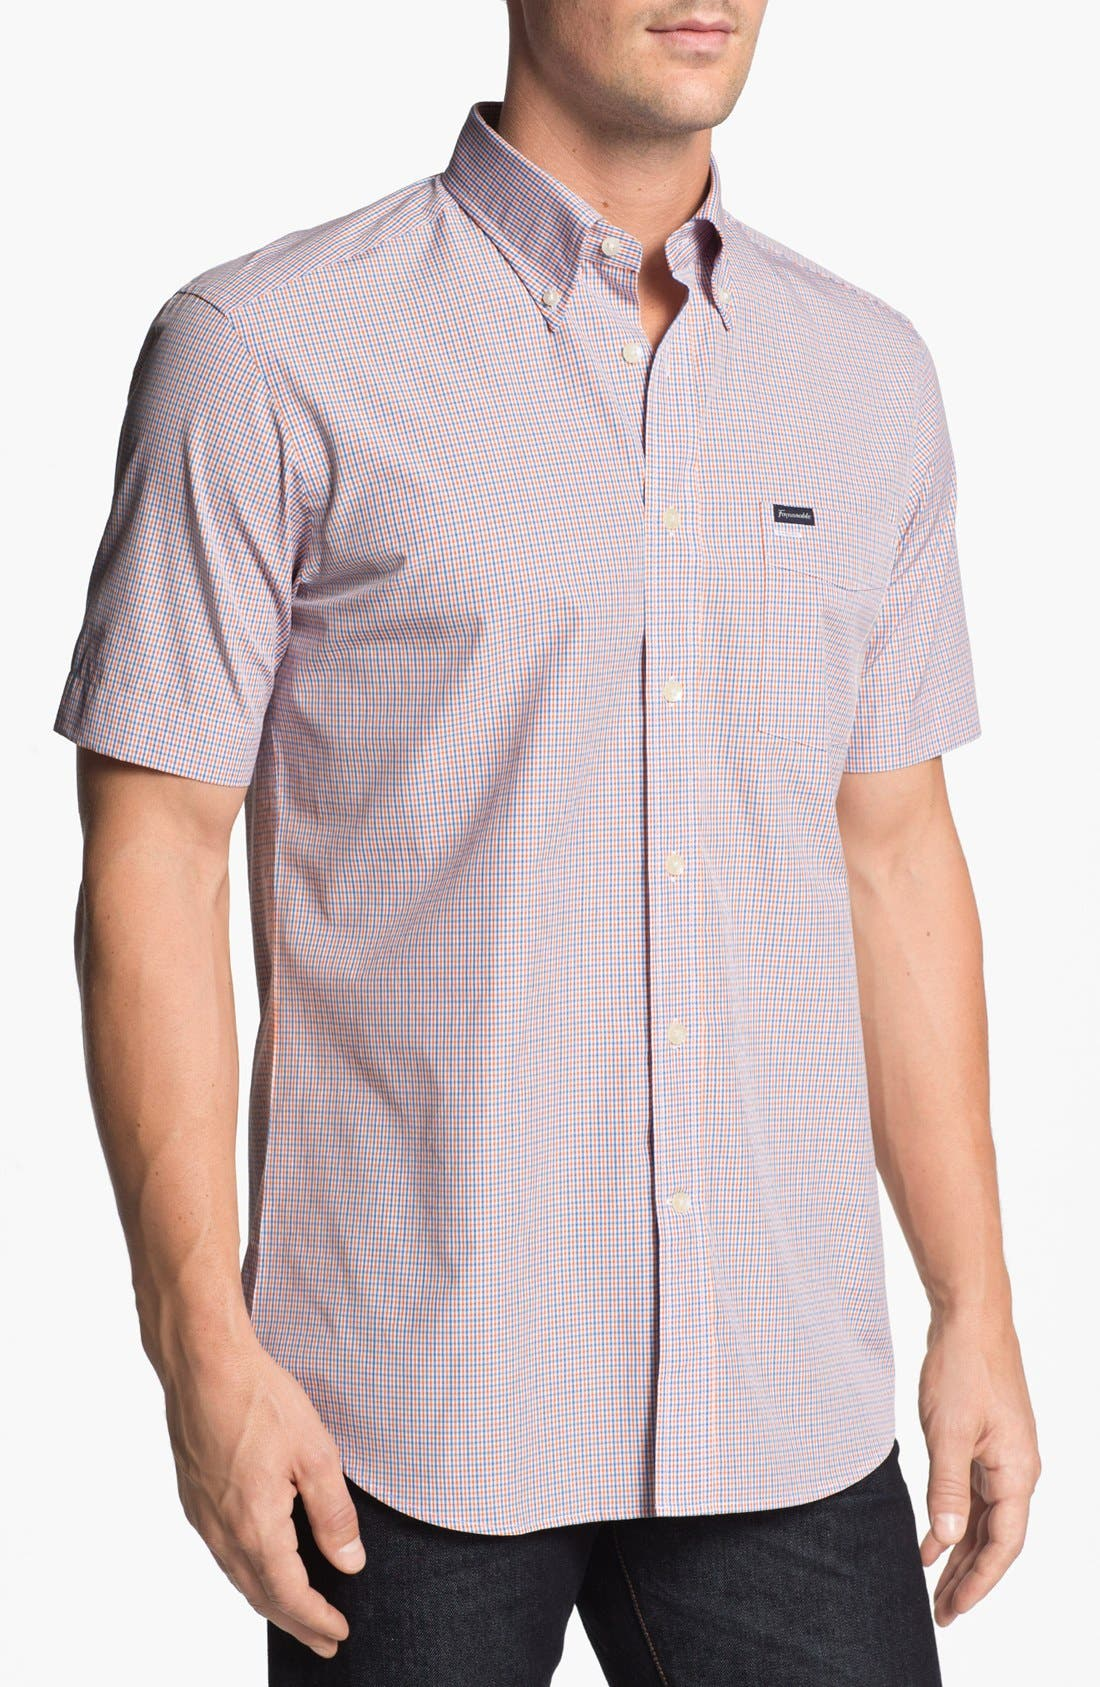 Alternate Image 1 Selected - Façonnable Club Fit Short Sleeve Sport Shirt